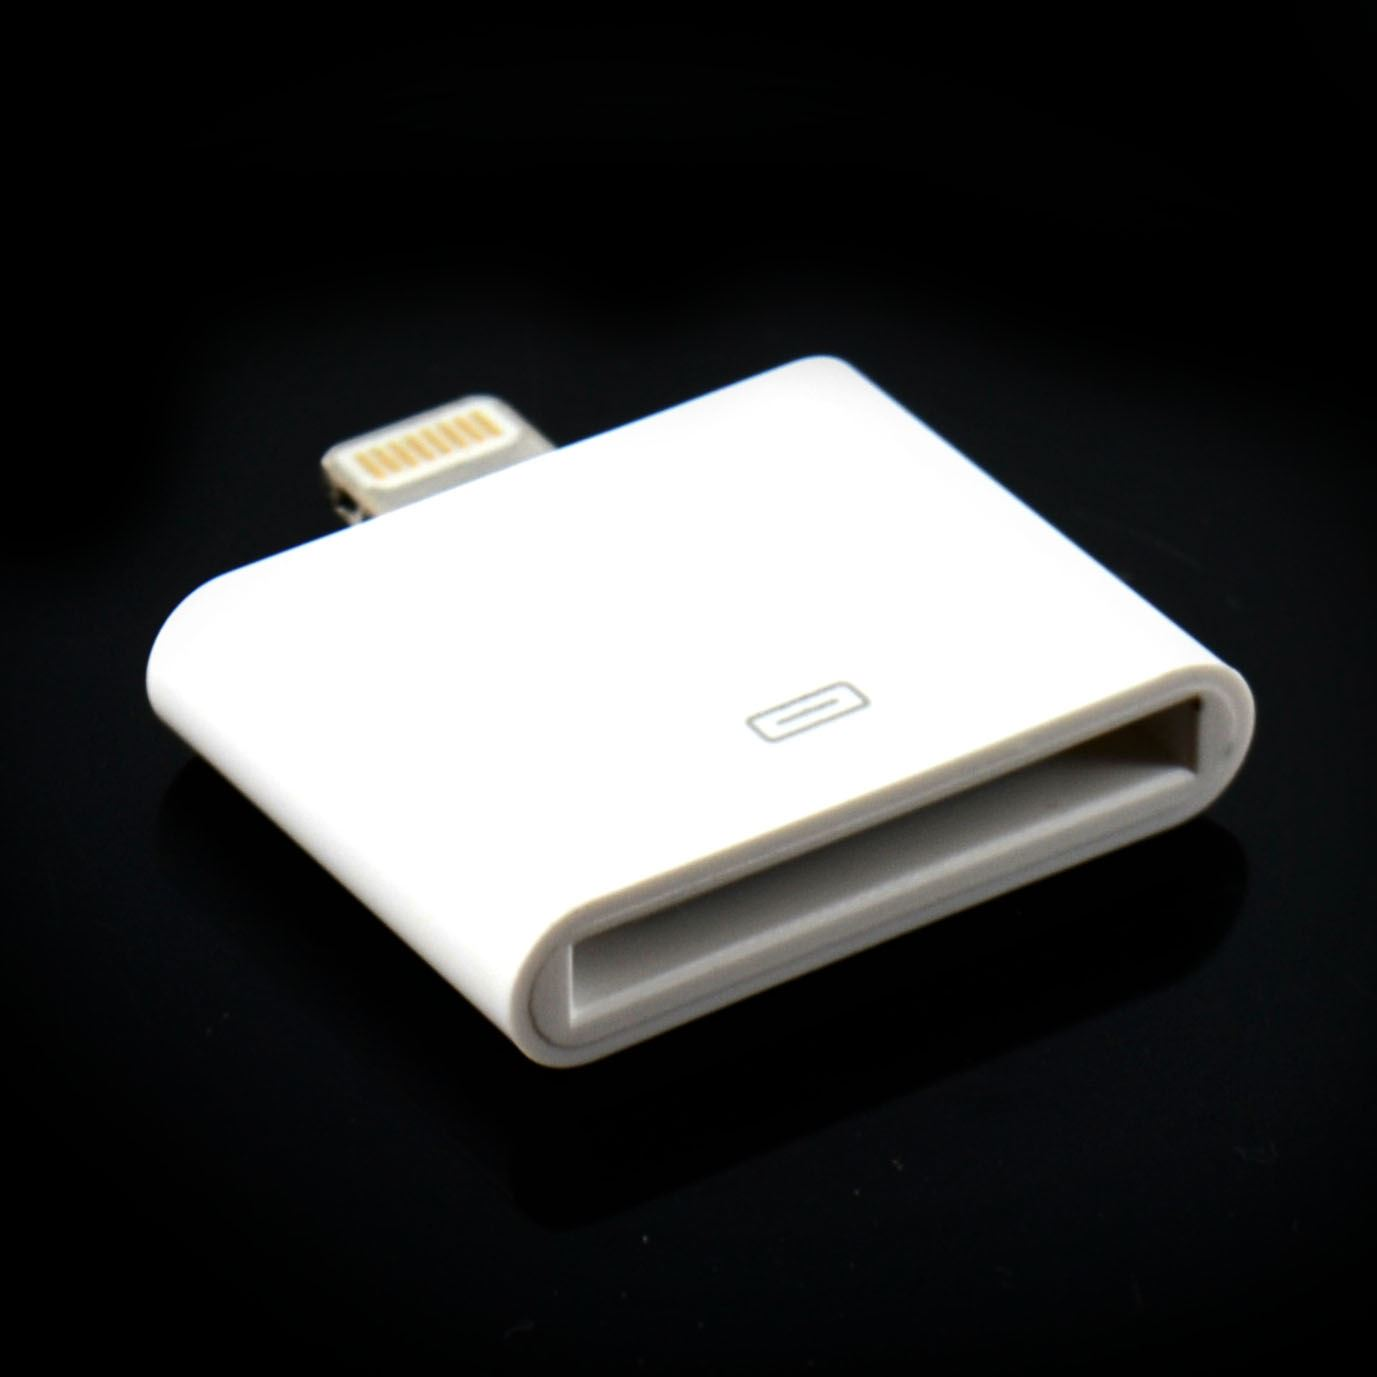 IPhone 4 To 5 5s IPad Mini 30 Pin Lightning Converter